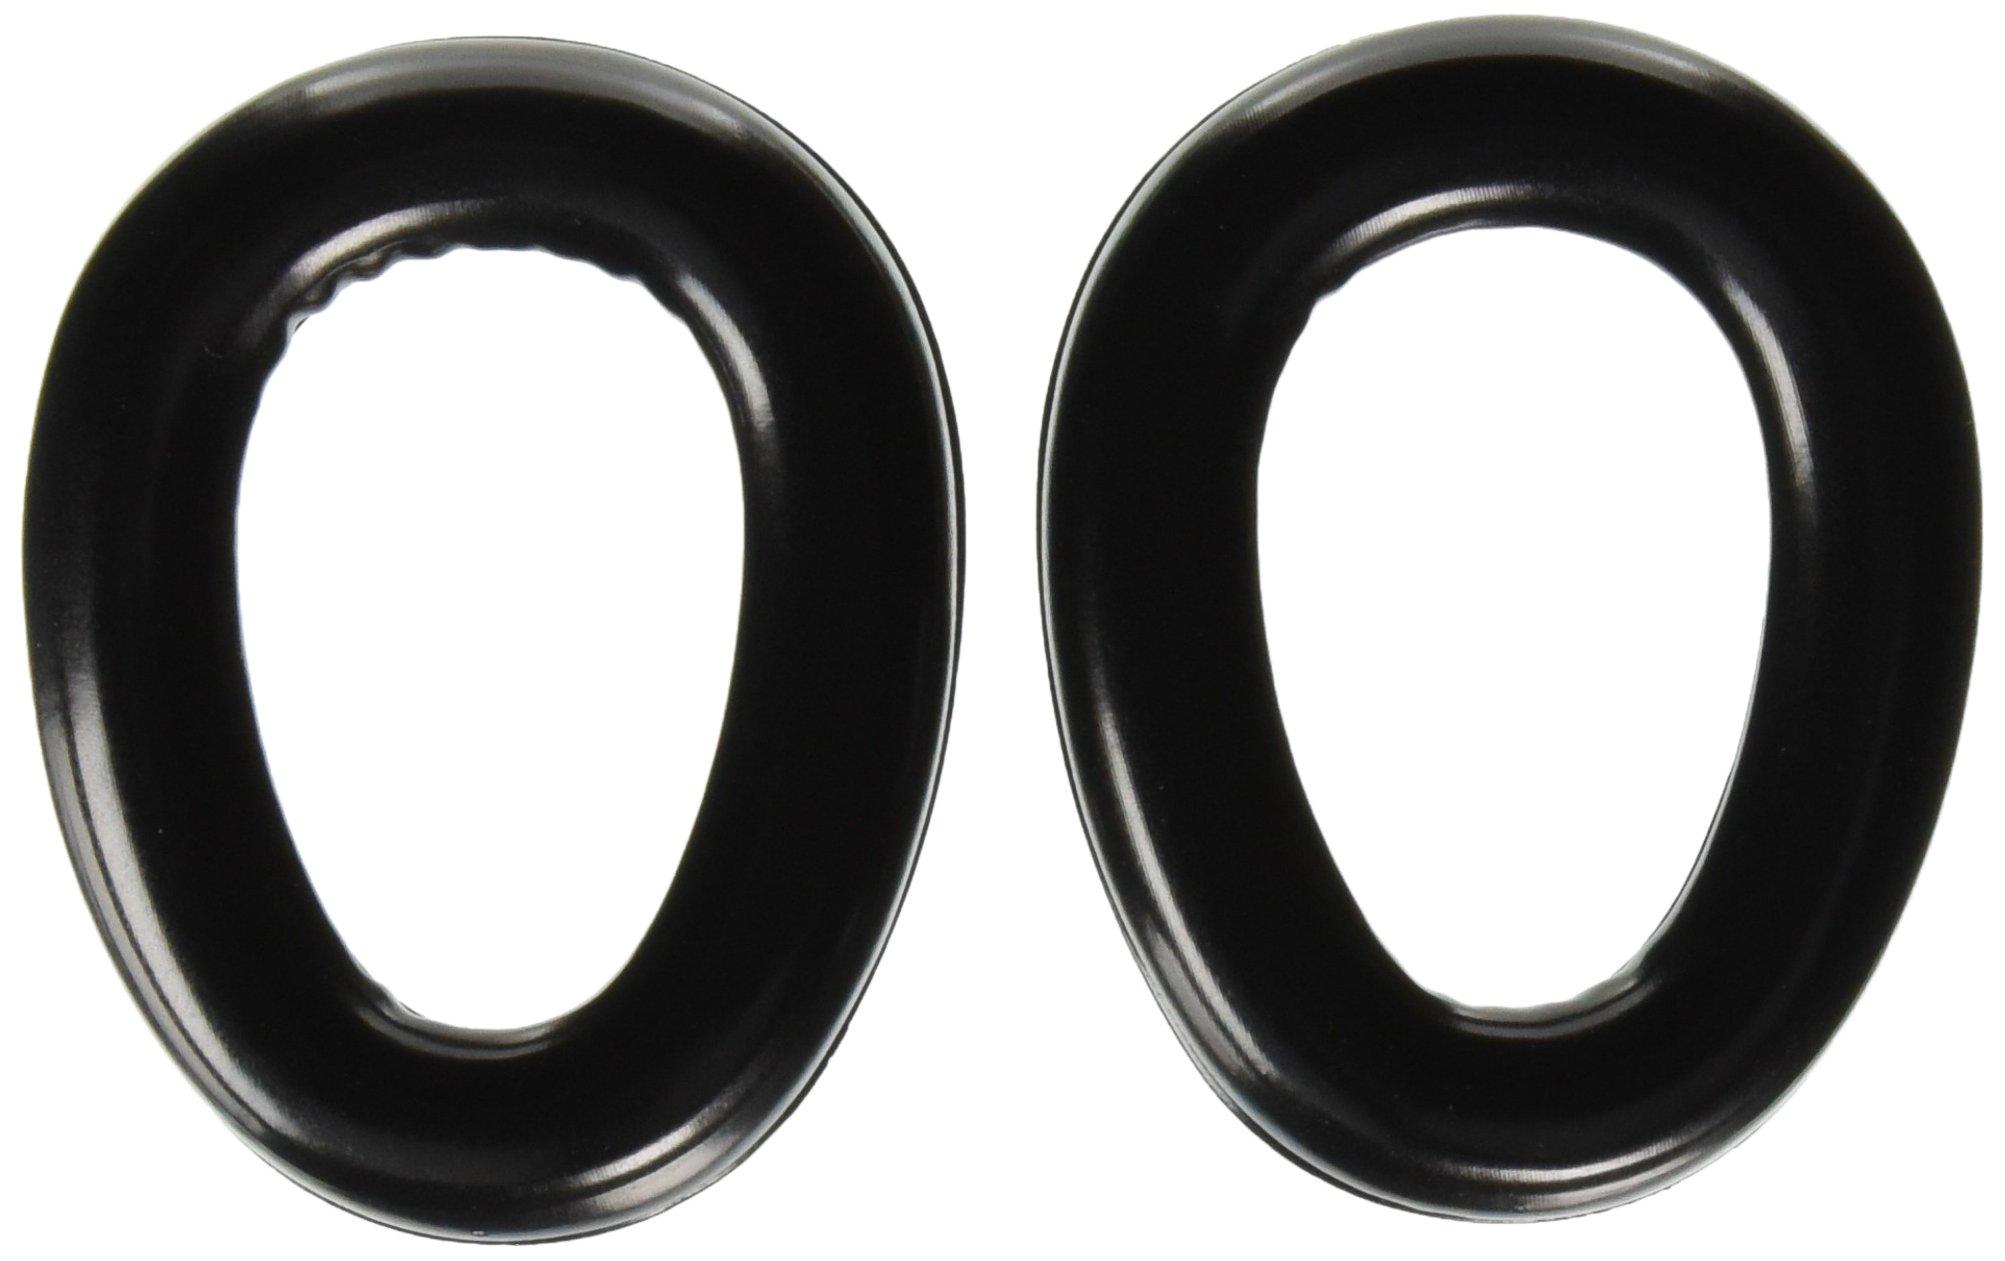 MSA 10092879 Left/Right Earmuff Hygiene Kit, Medium (Pack of 2) by MSA (Image #2)